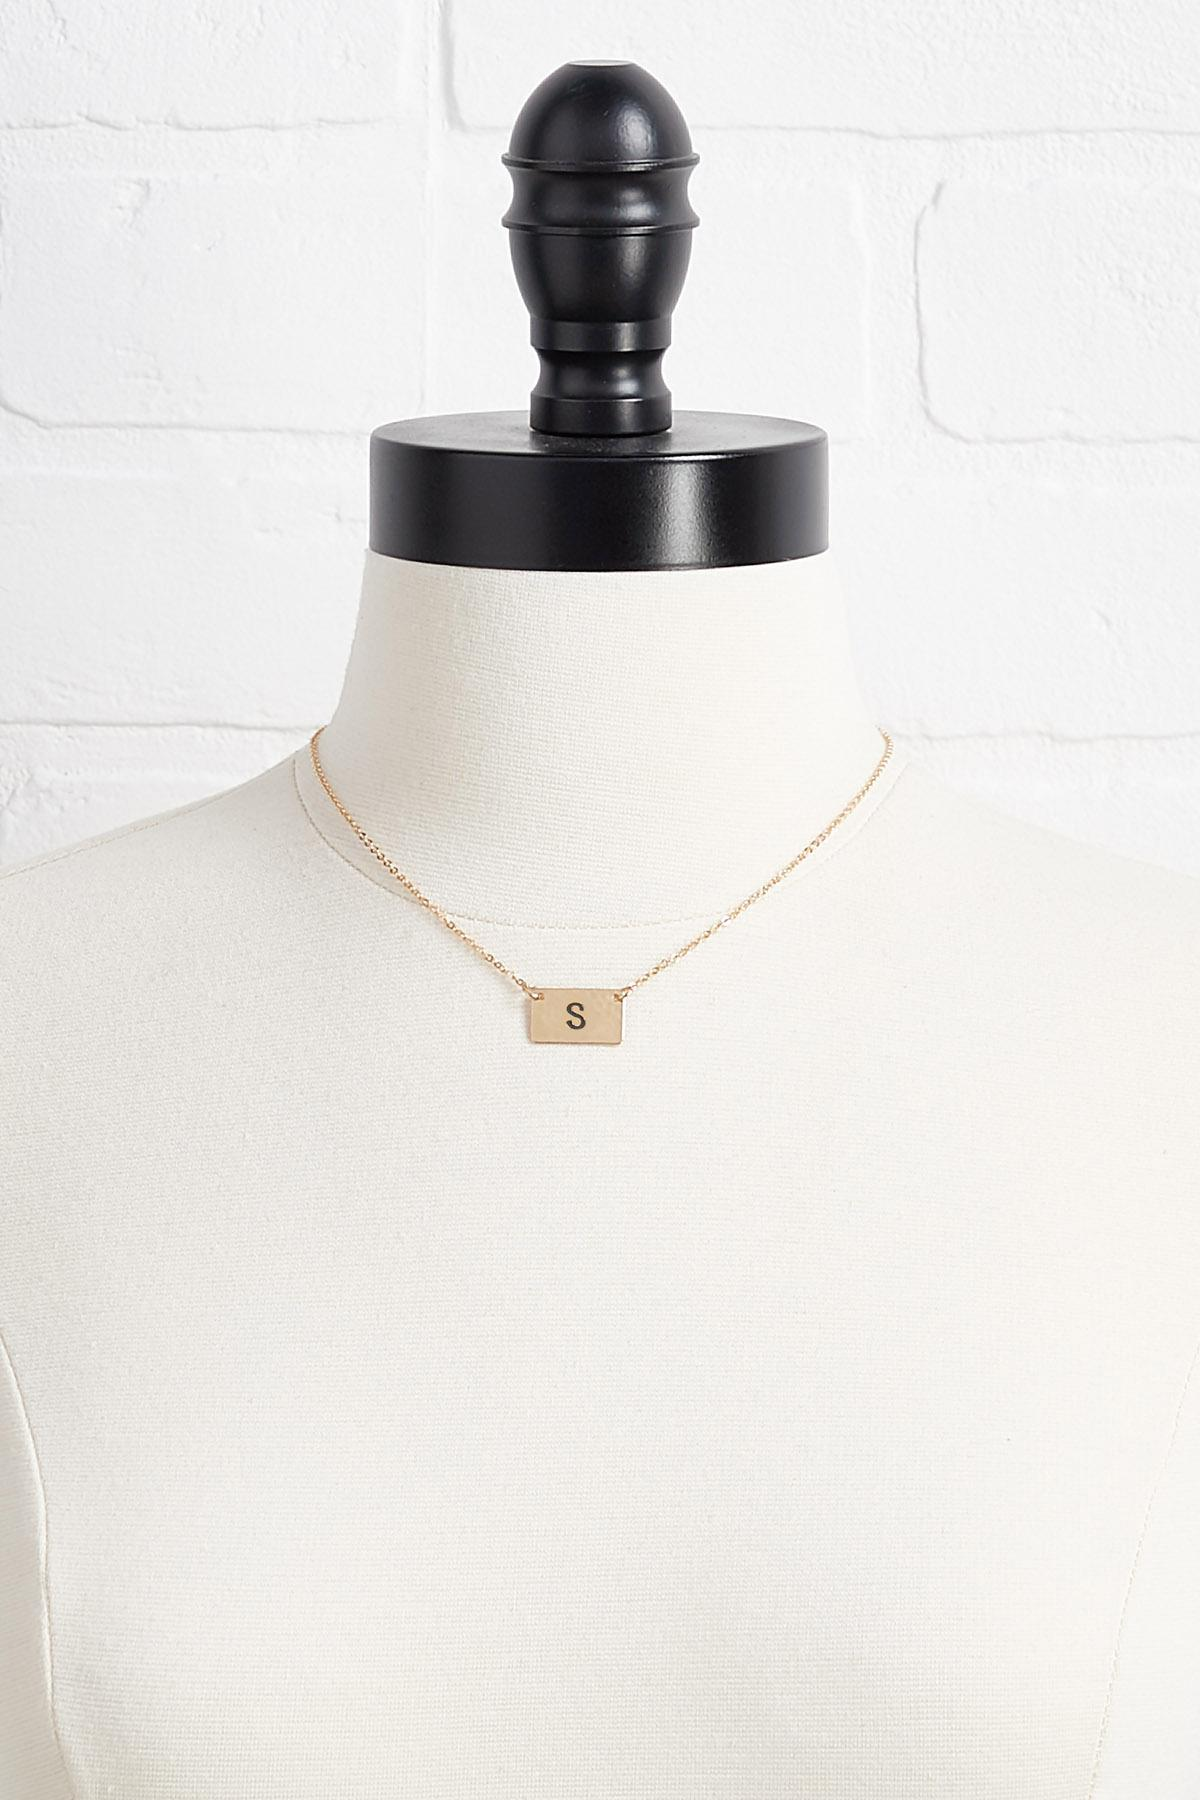 S Initial Pendant Necklace